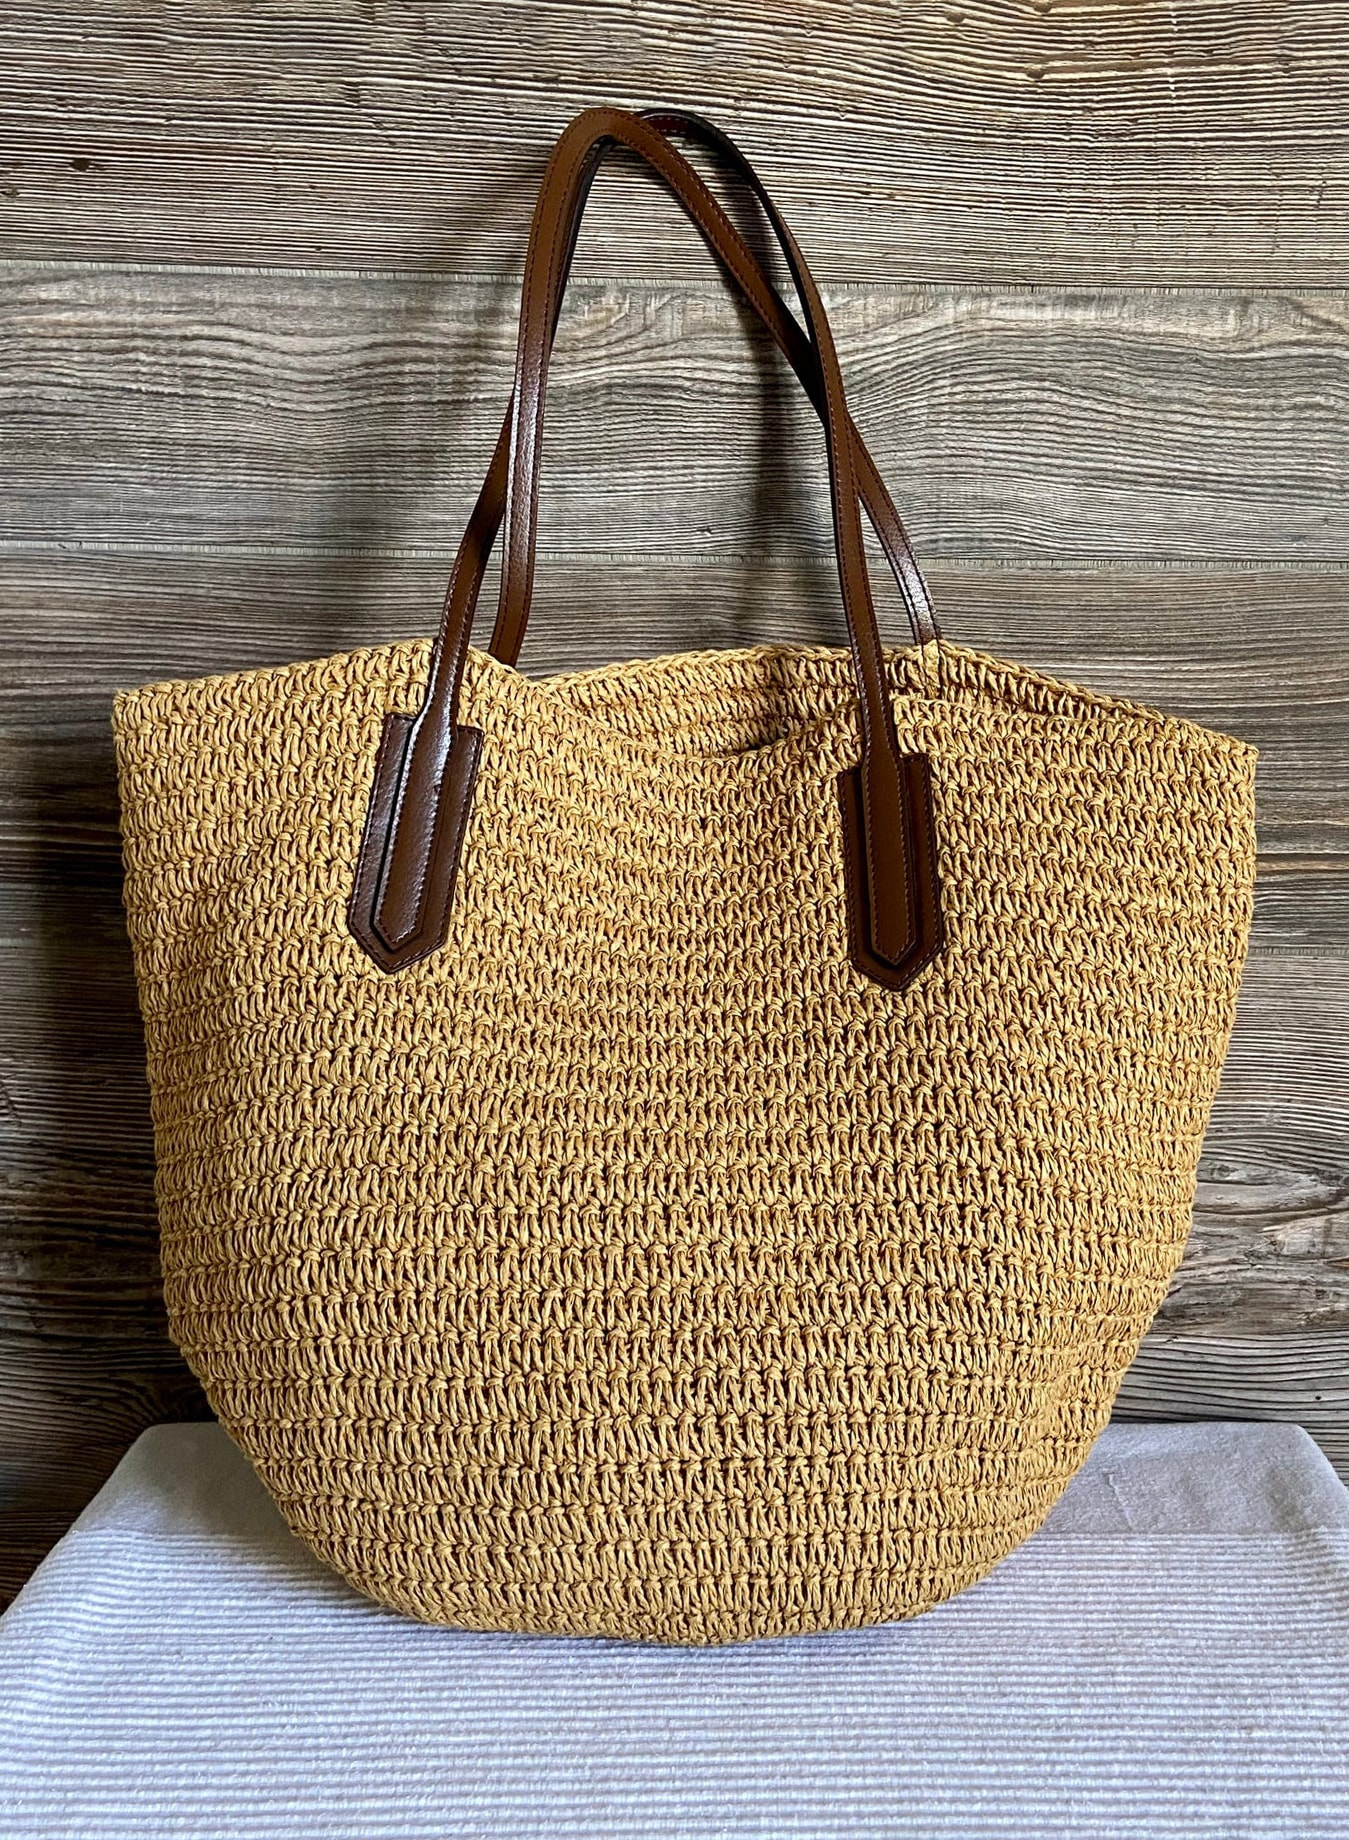 J CREW Woven Straw Shoulder Shopper Beach Bag Purse